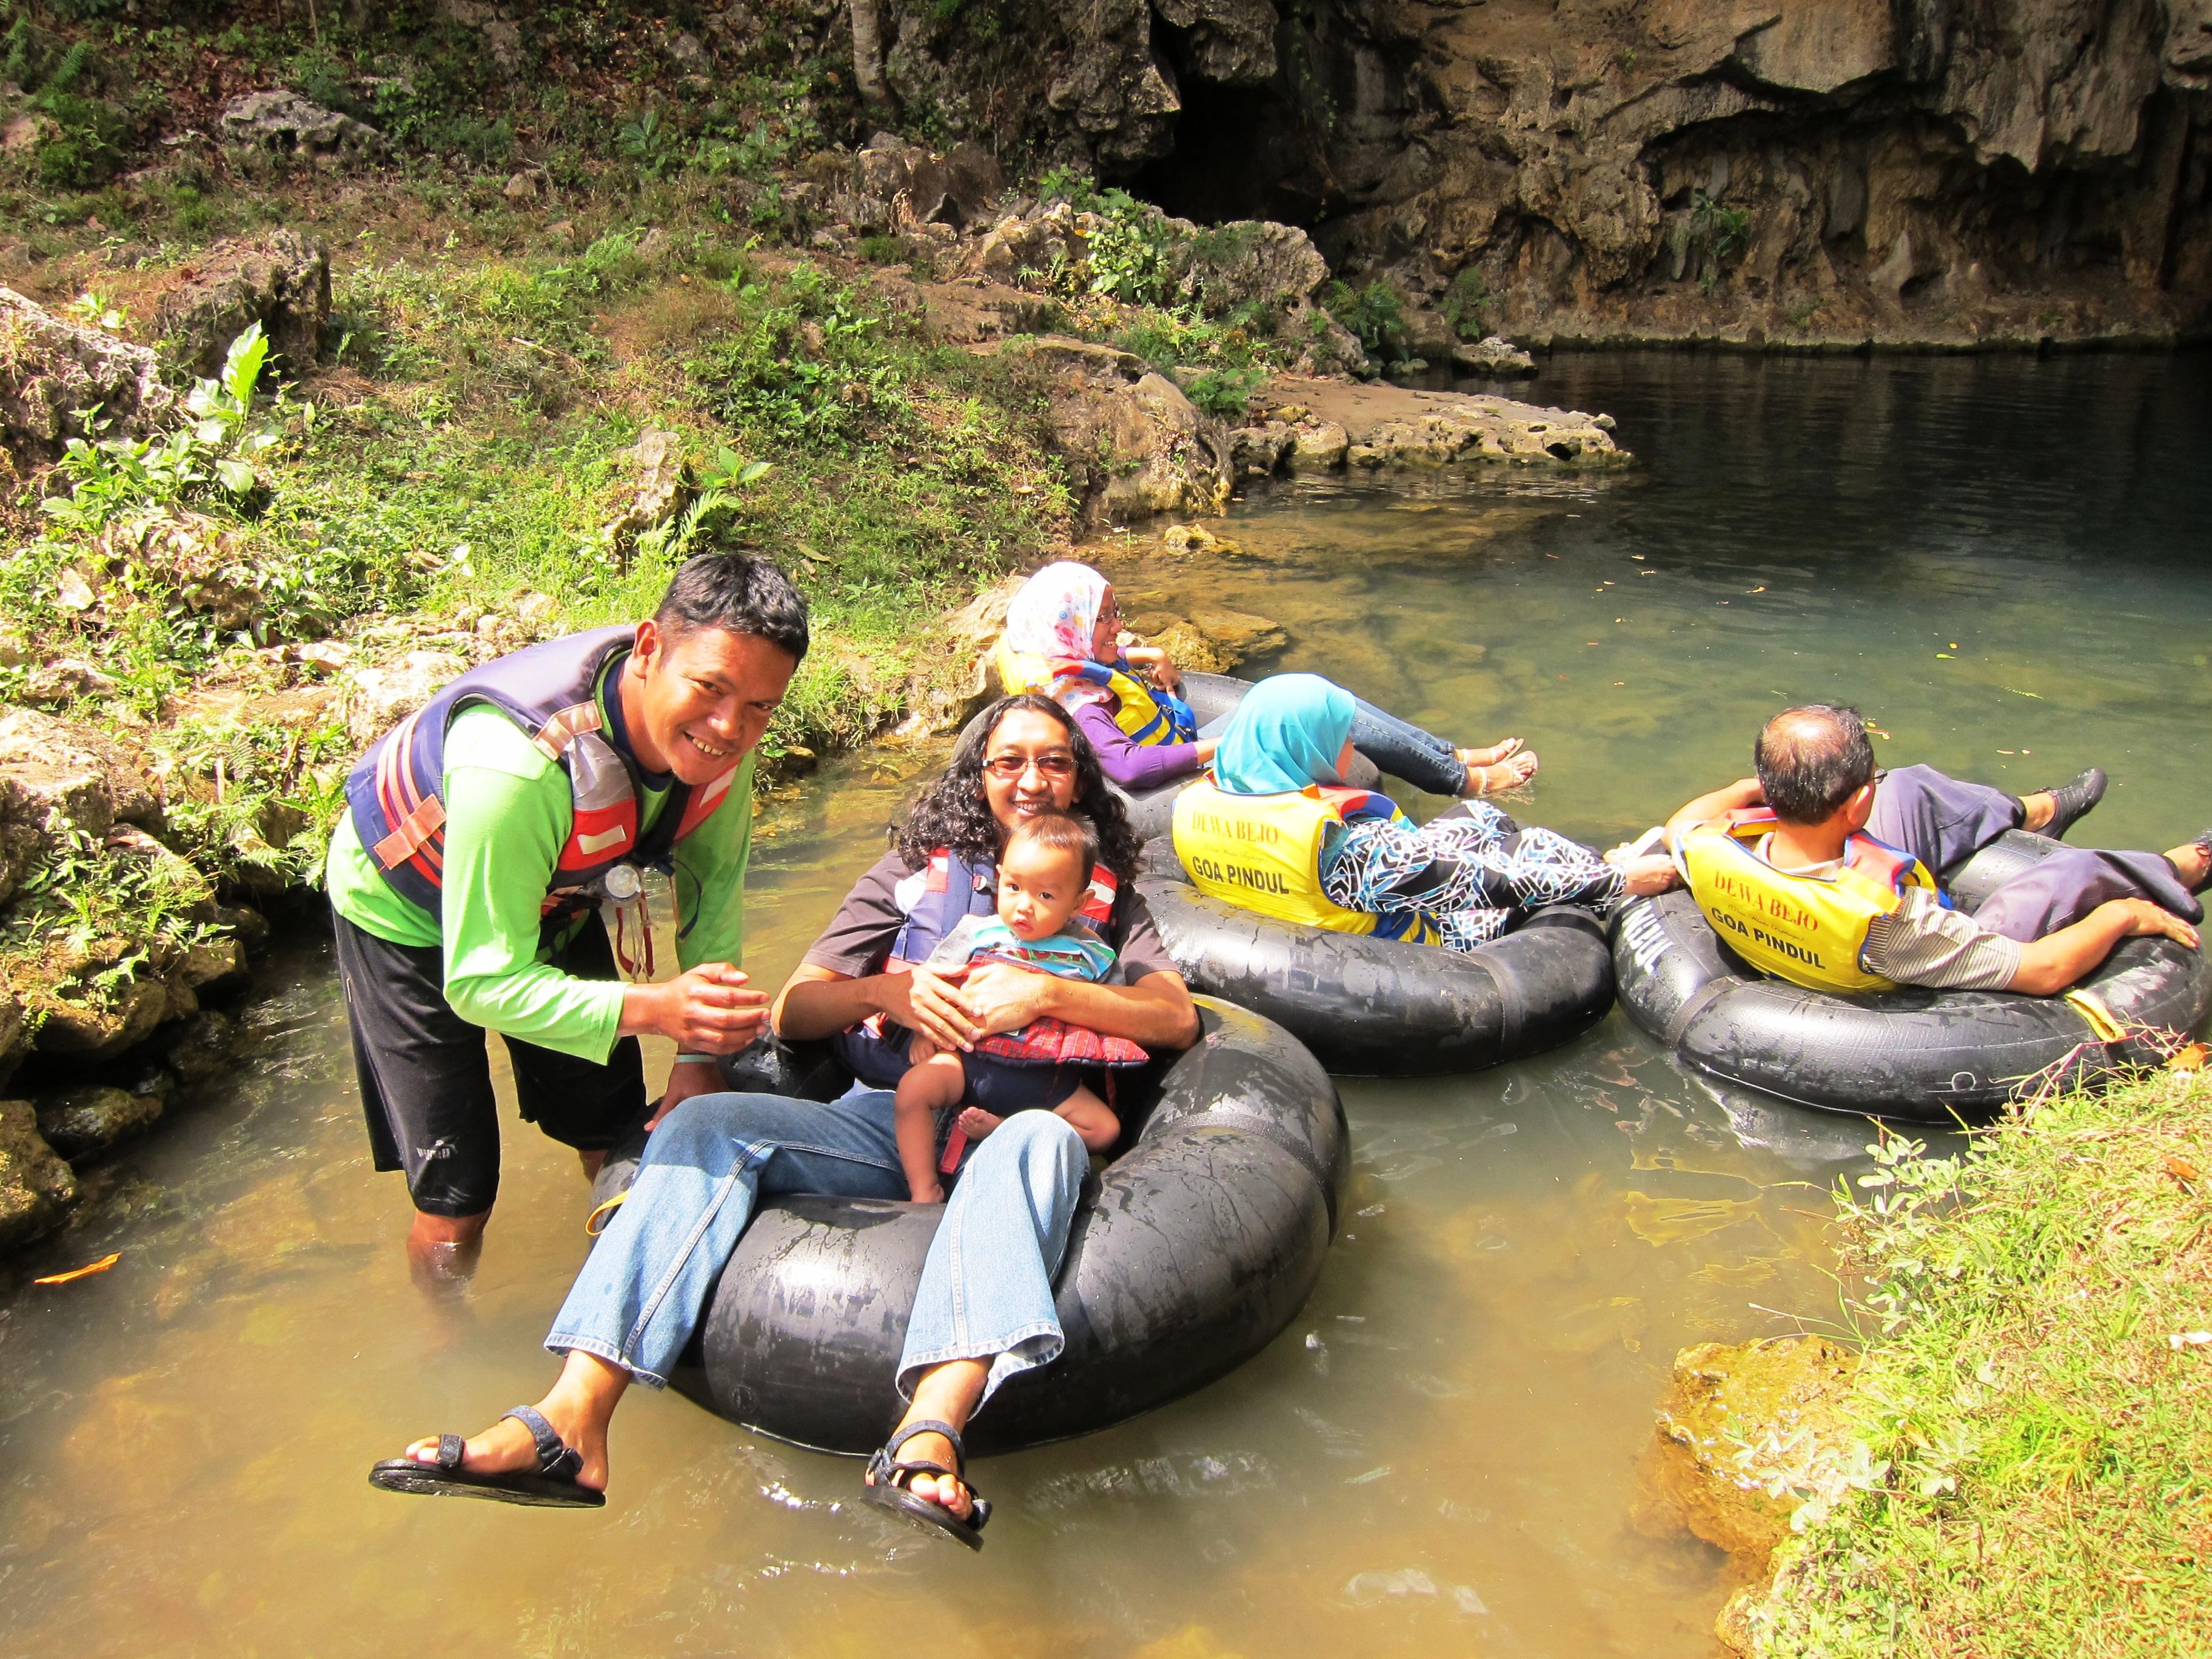 Caving, Tubing, Rafting di Goa Pindul dan Srigethuk bersama Bayi